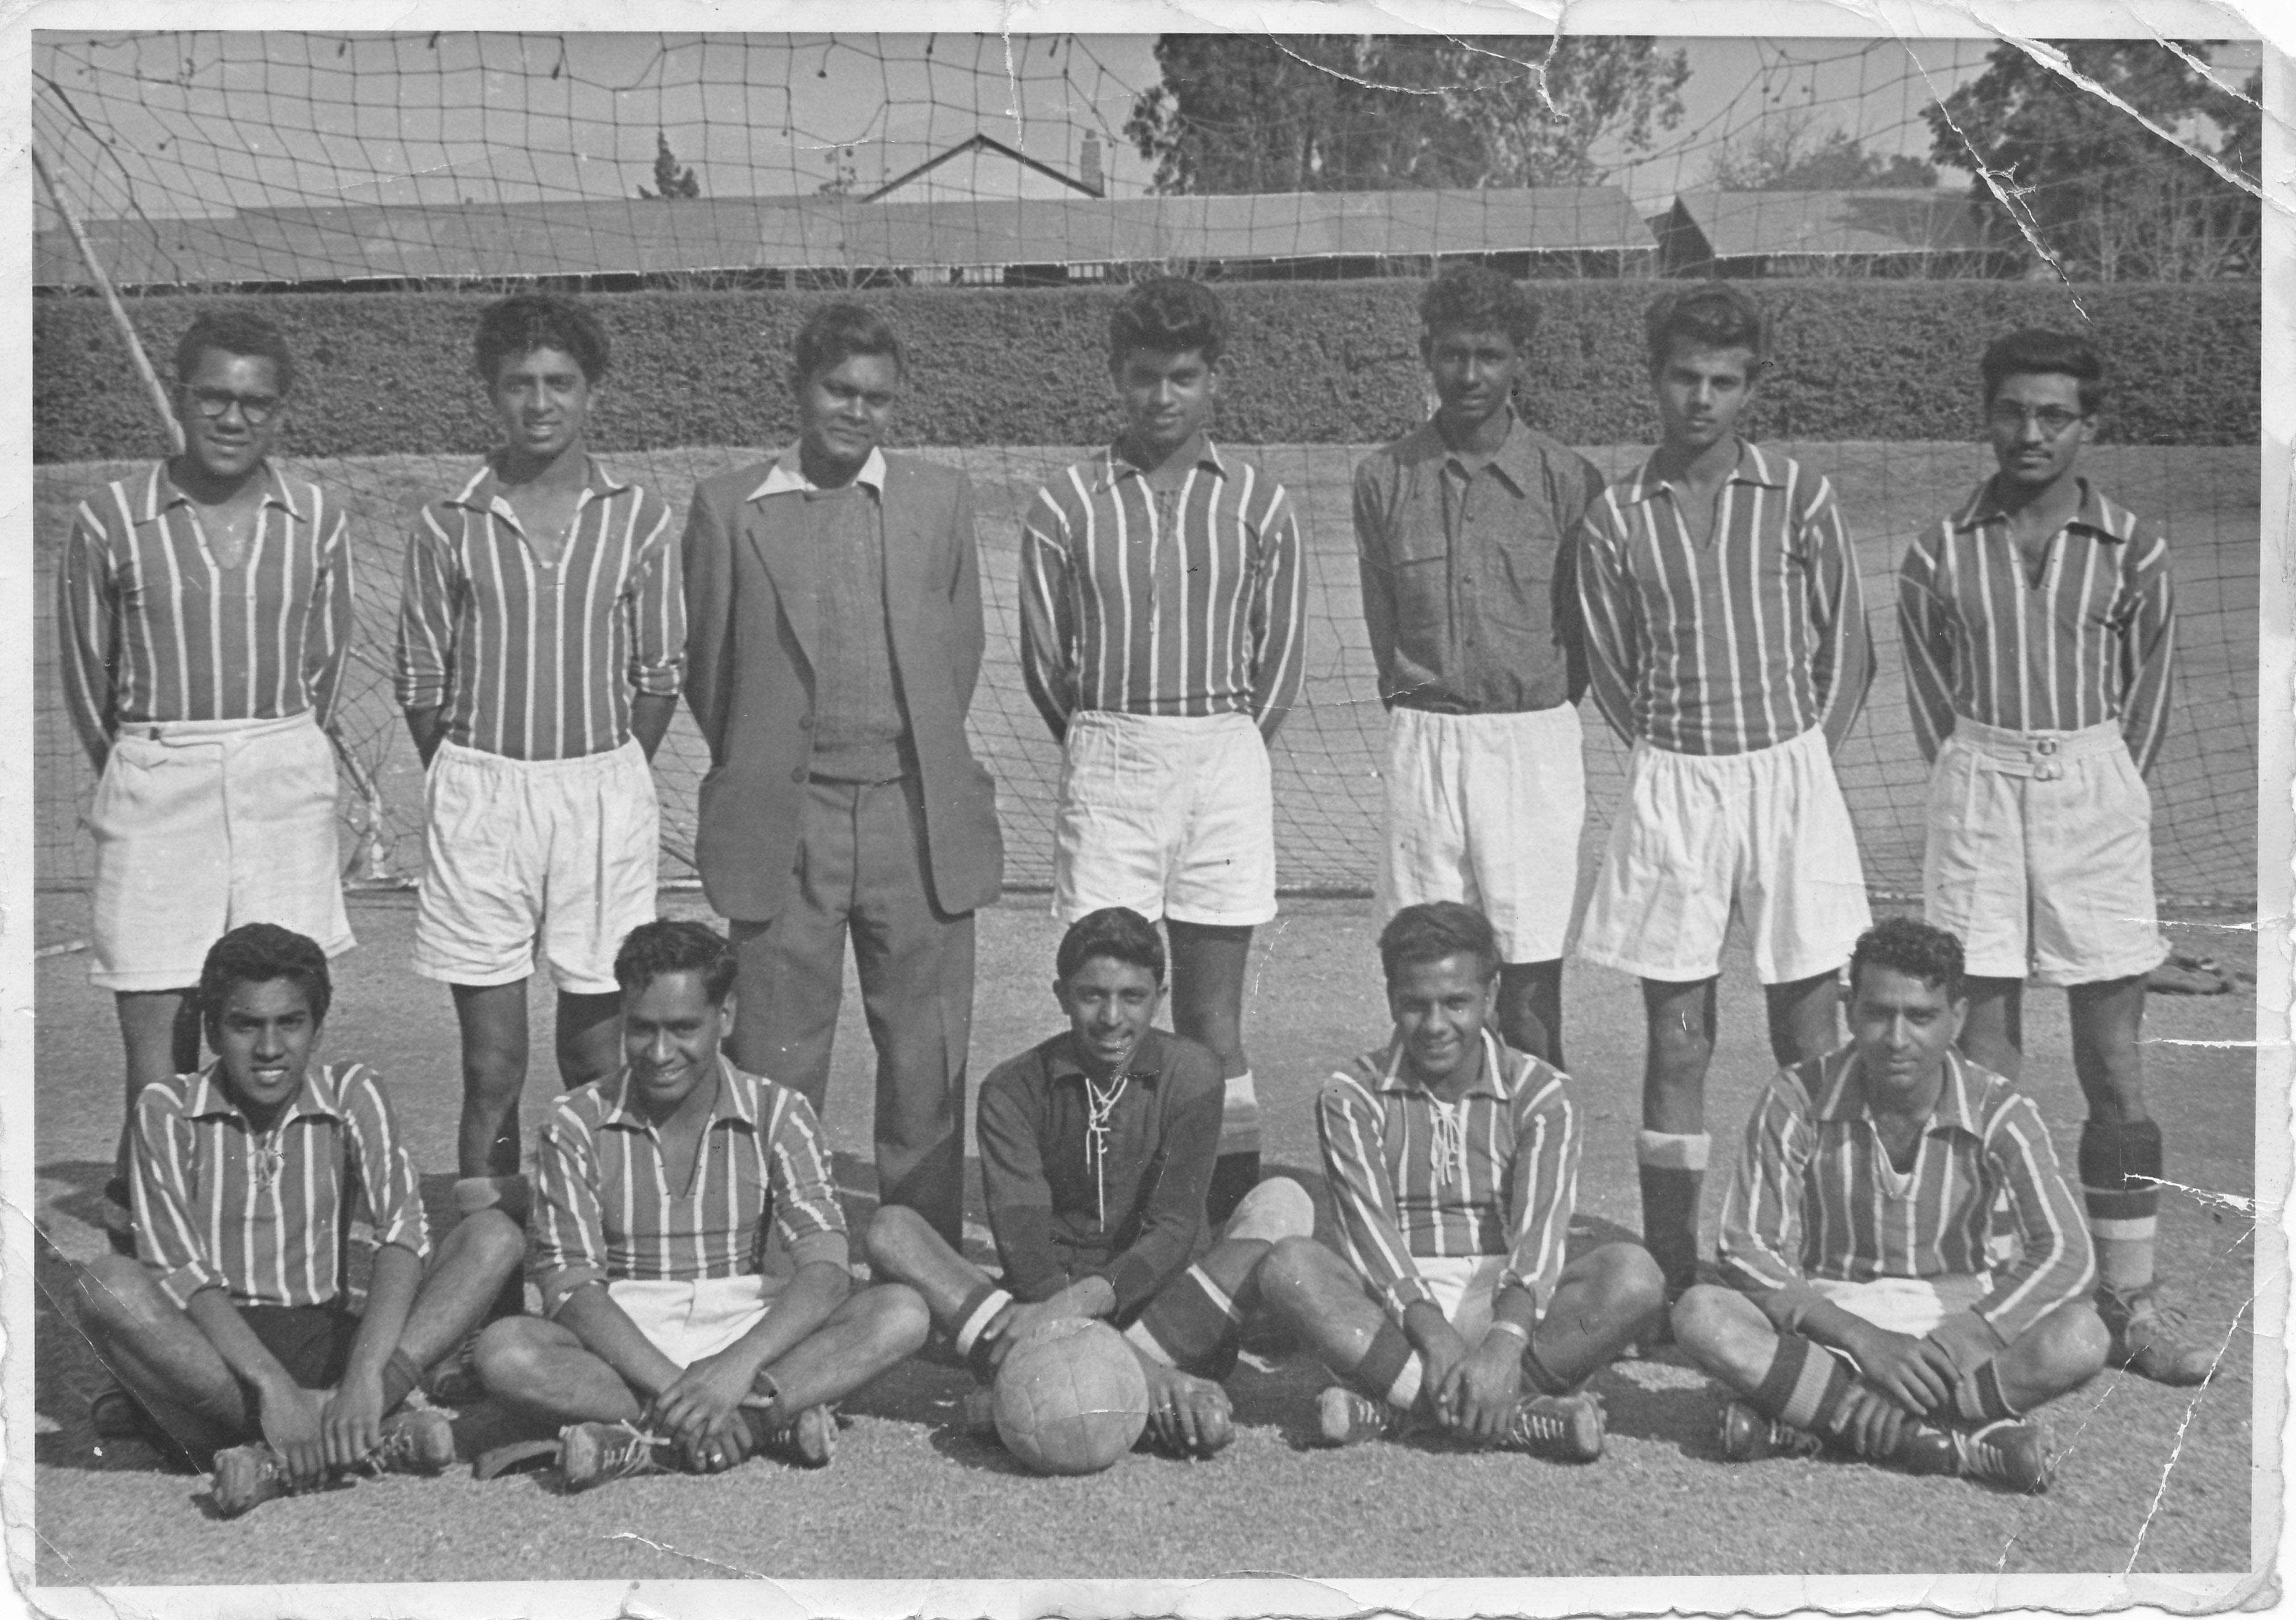 Swaraj 1950's